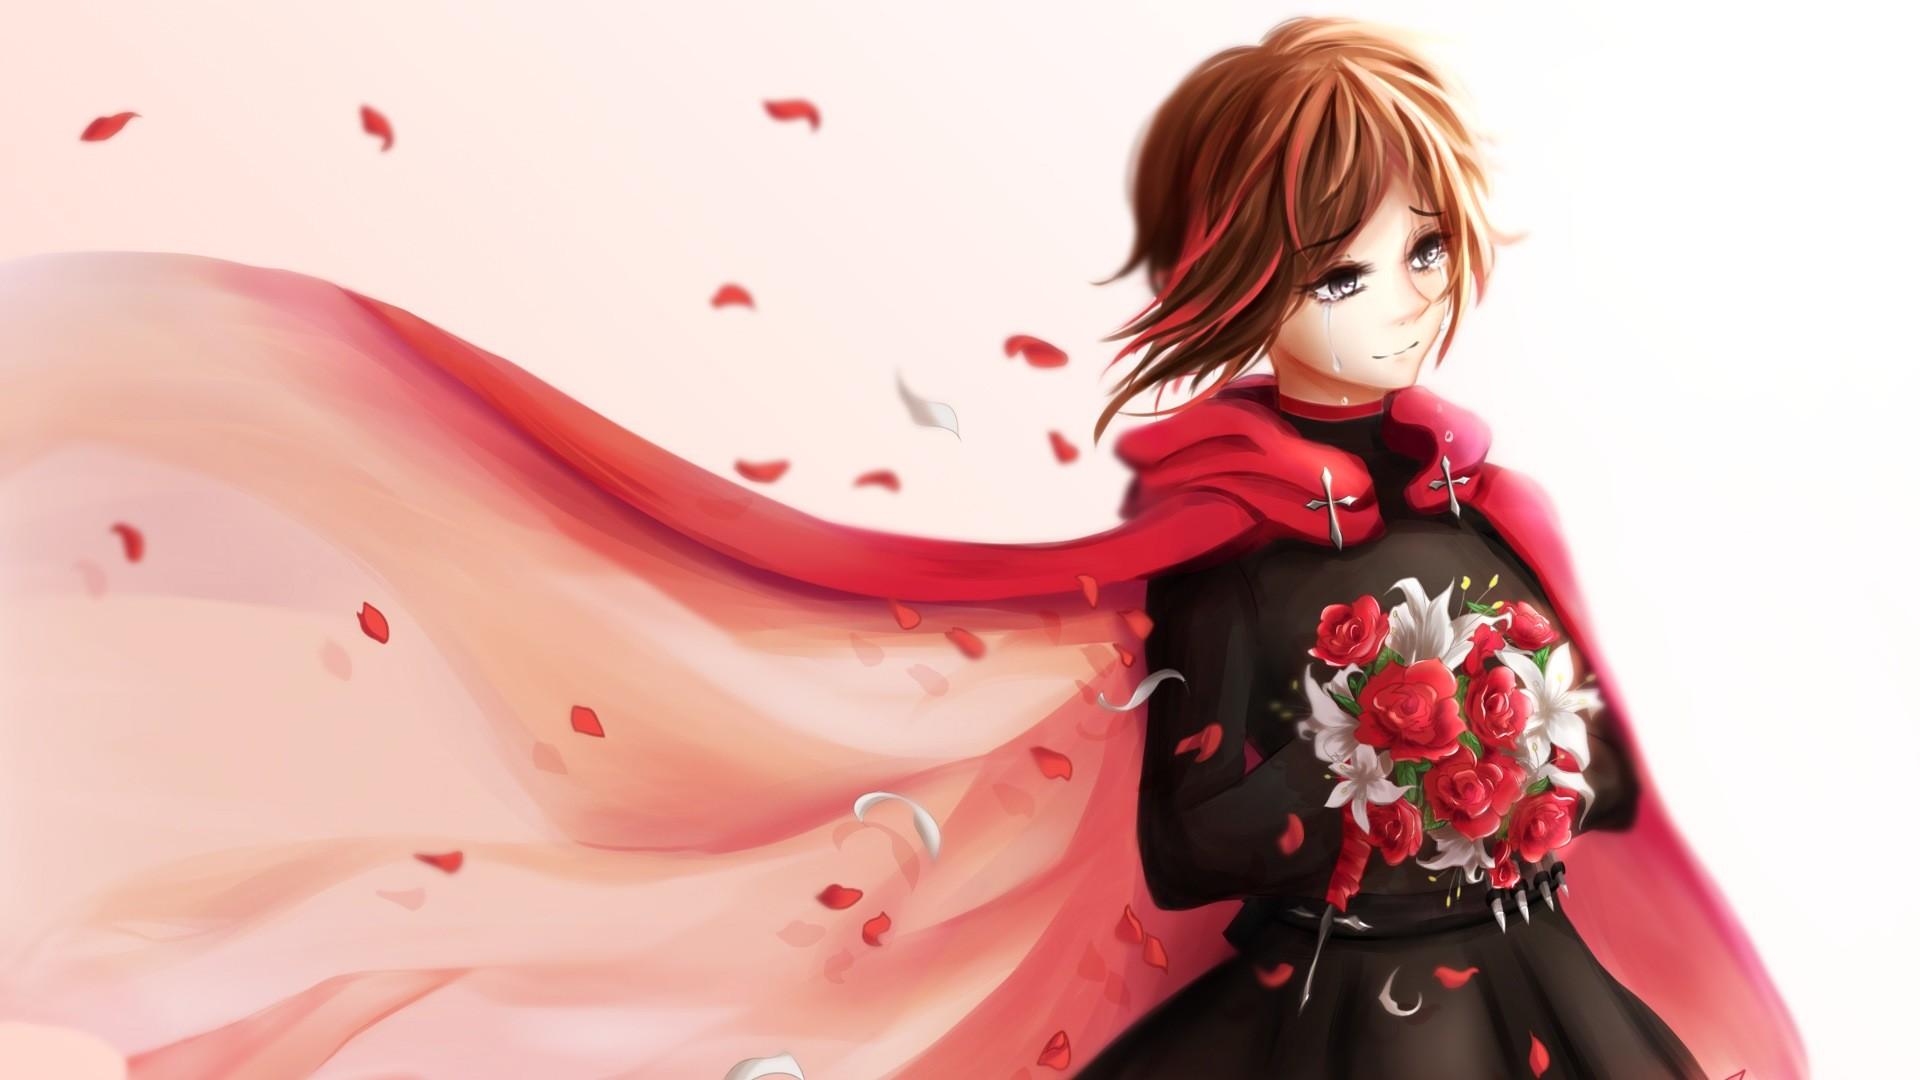 Wallpaper Rwby, Ruby rose, Anime, Girl, Bouquet